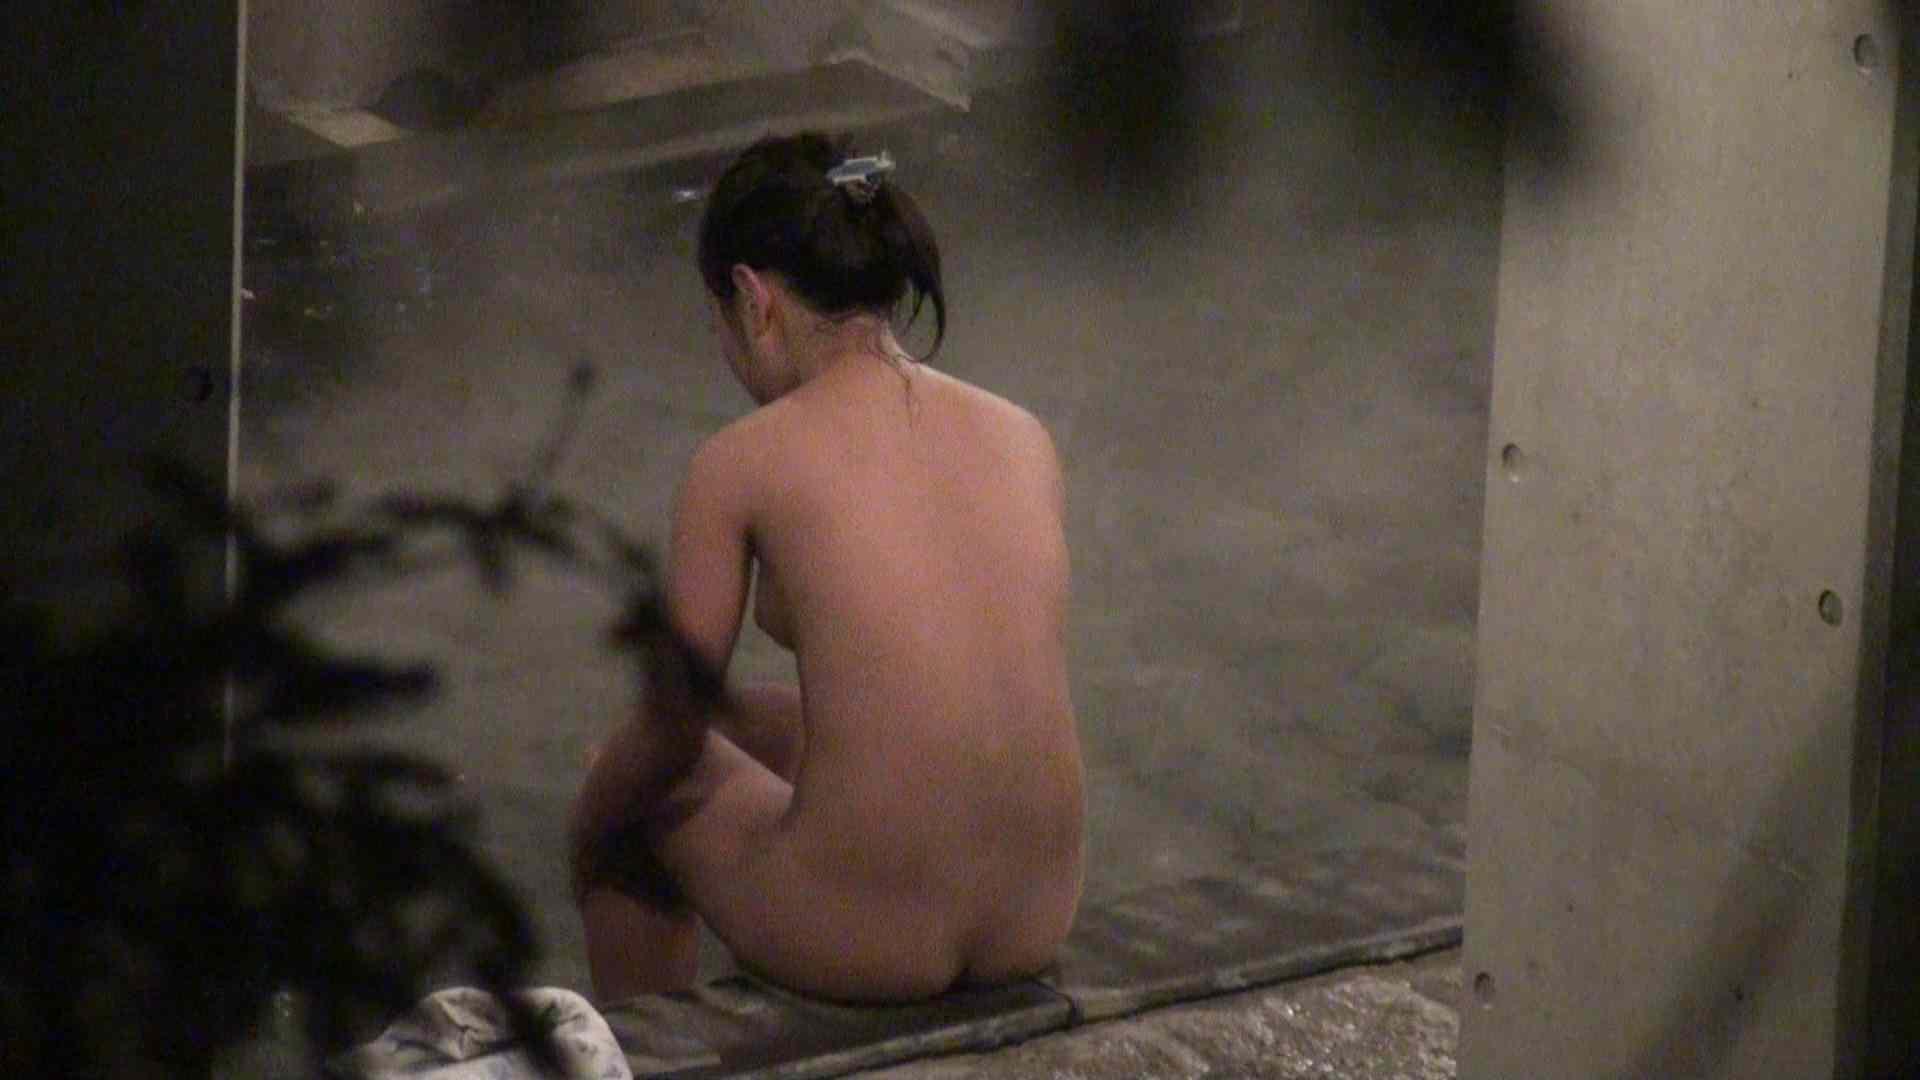 Aquaな露天風呂Vol.407 盗撮 ぱこり動画紹介 107画像 83